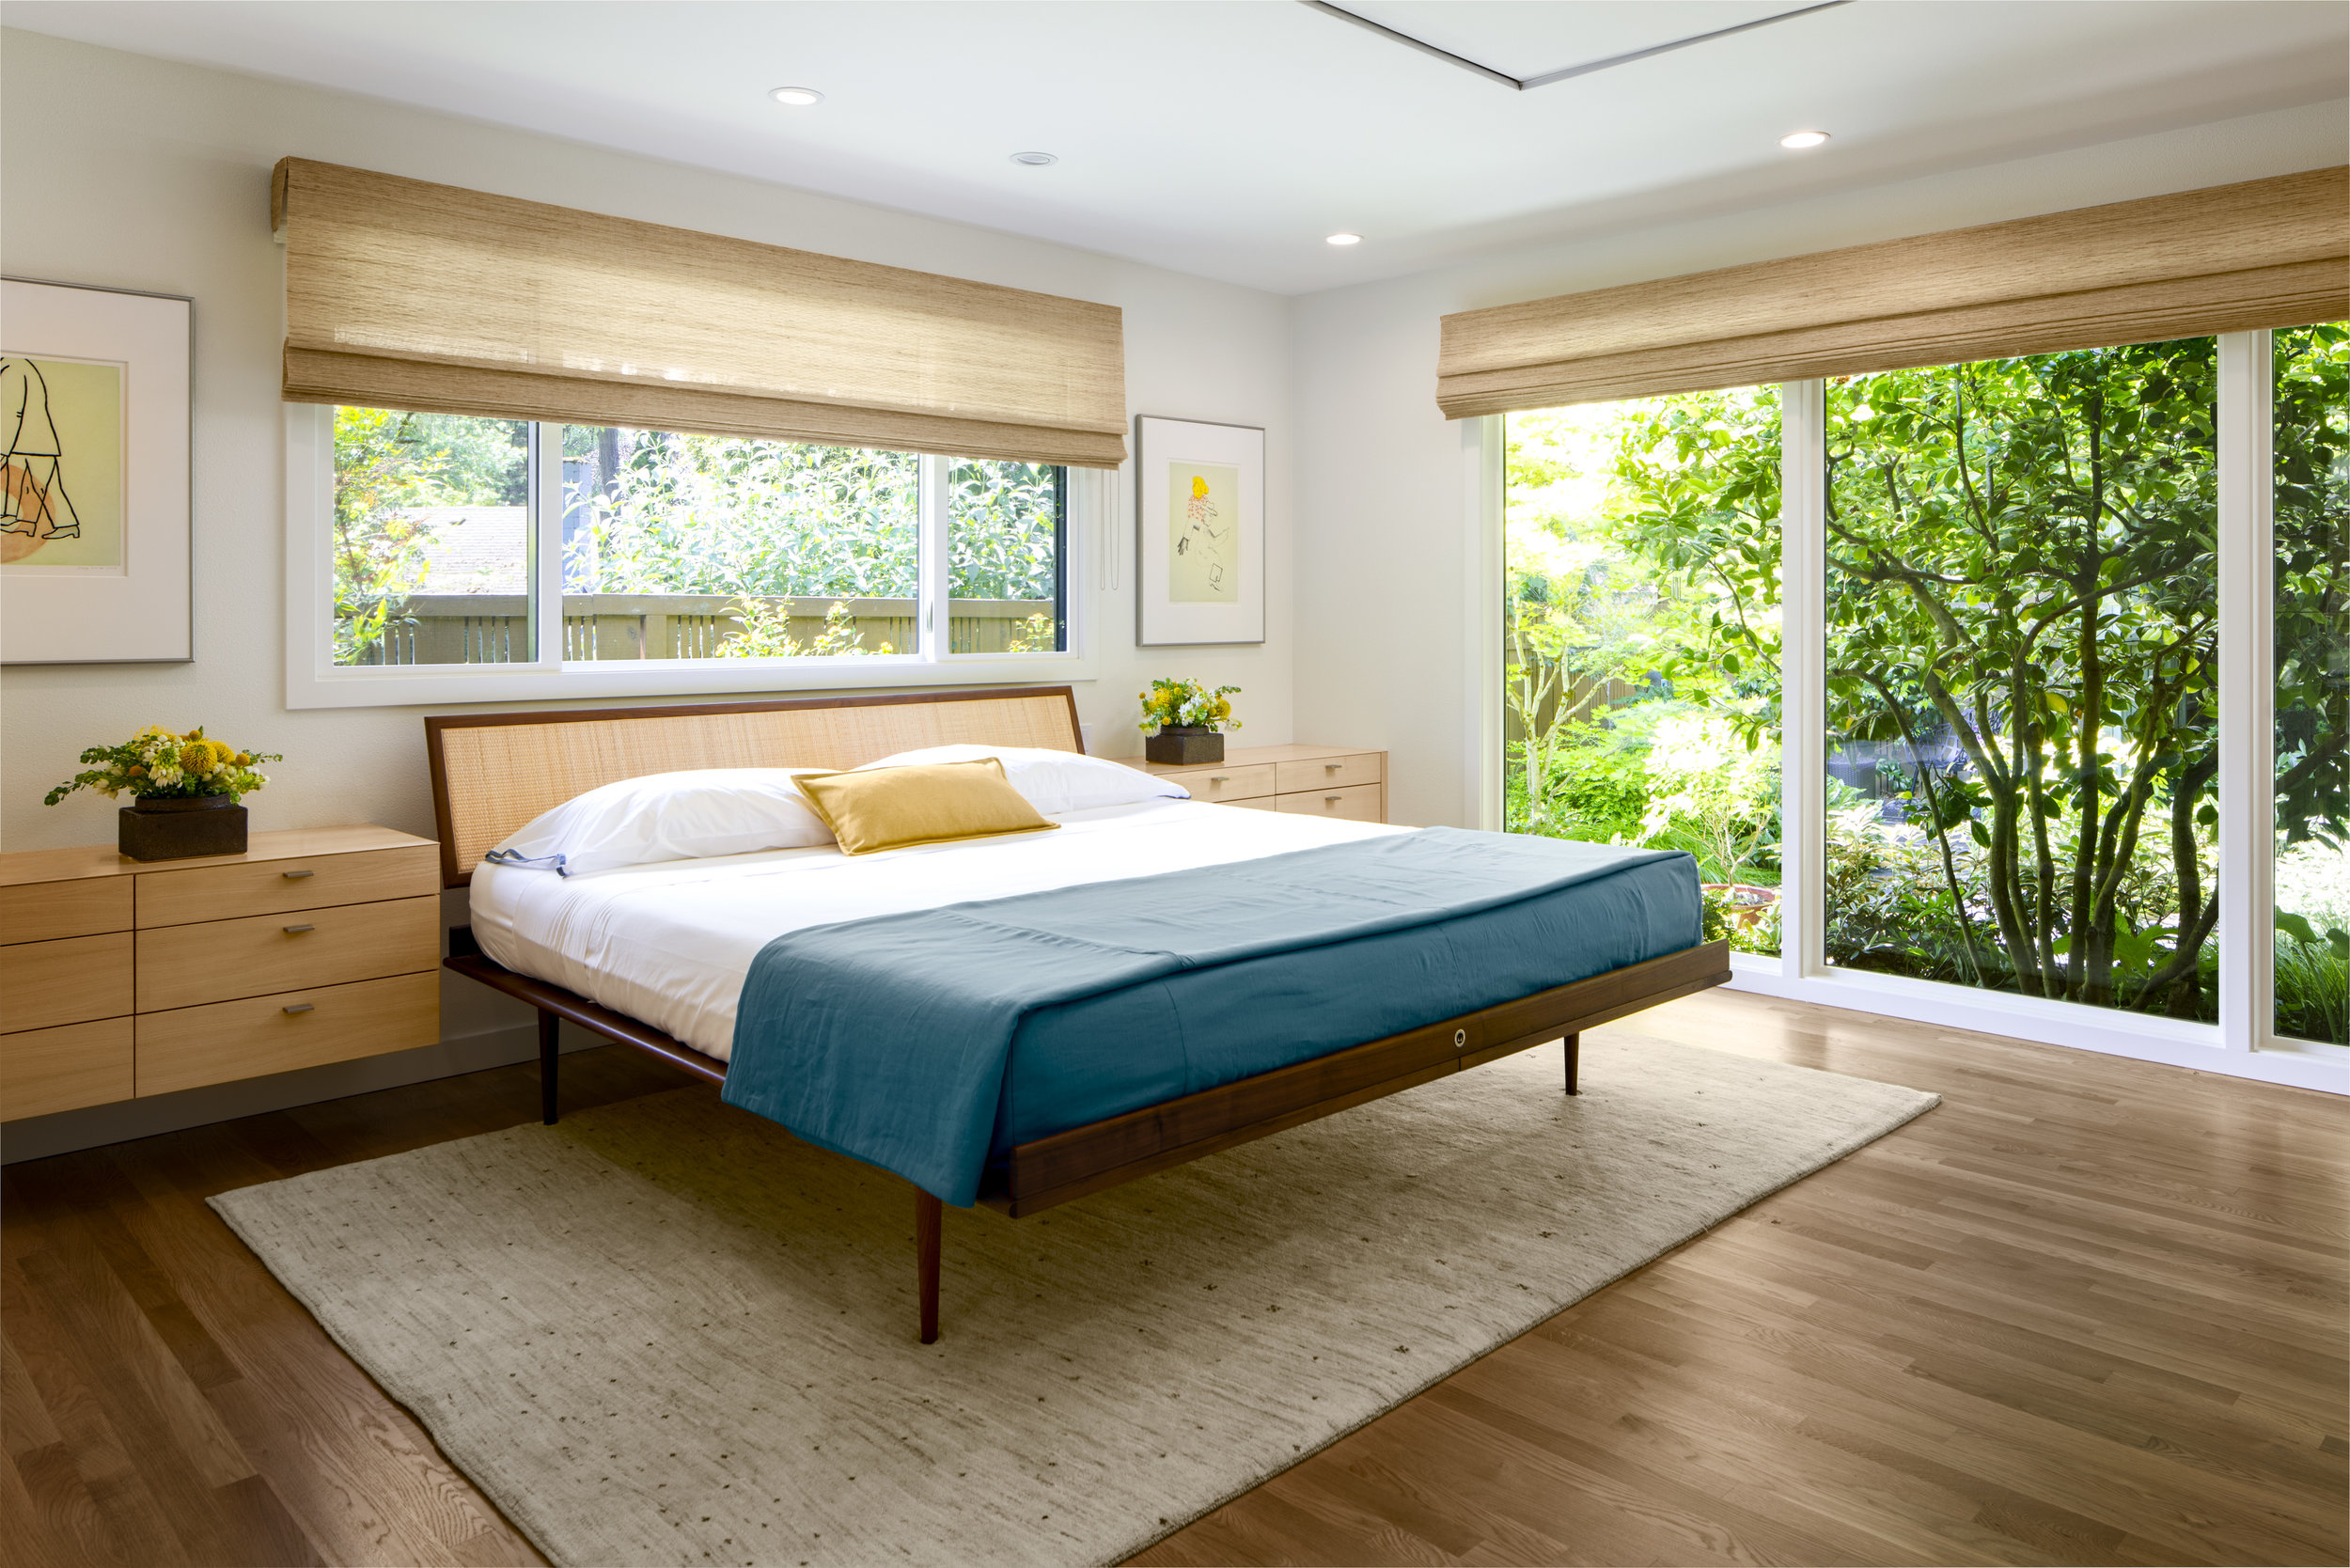 Portland Midcentury Master Suite